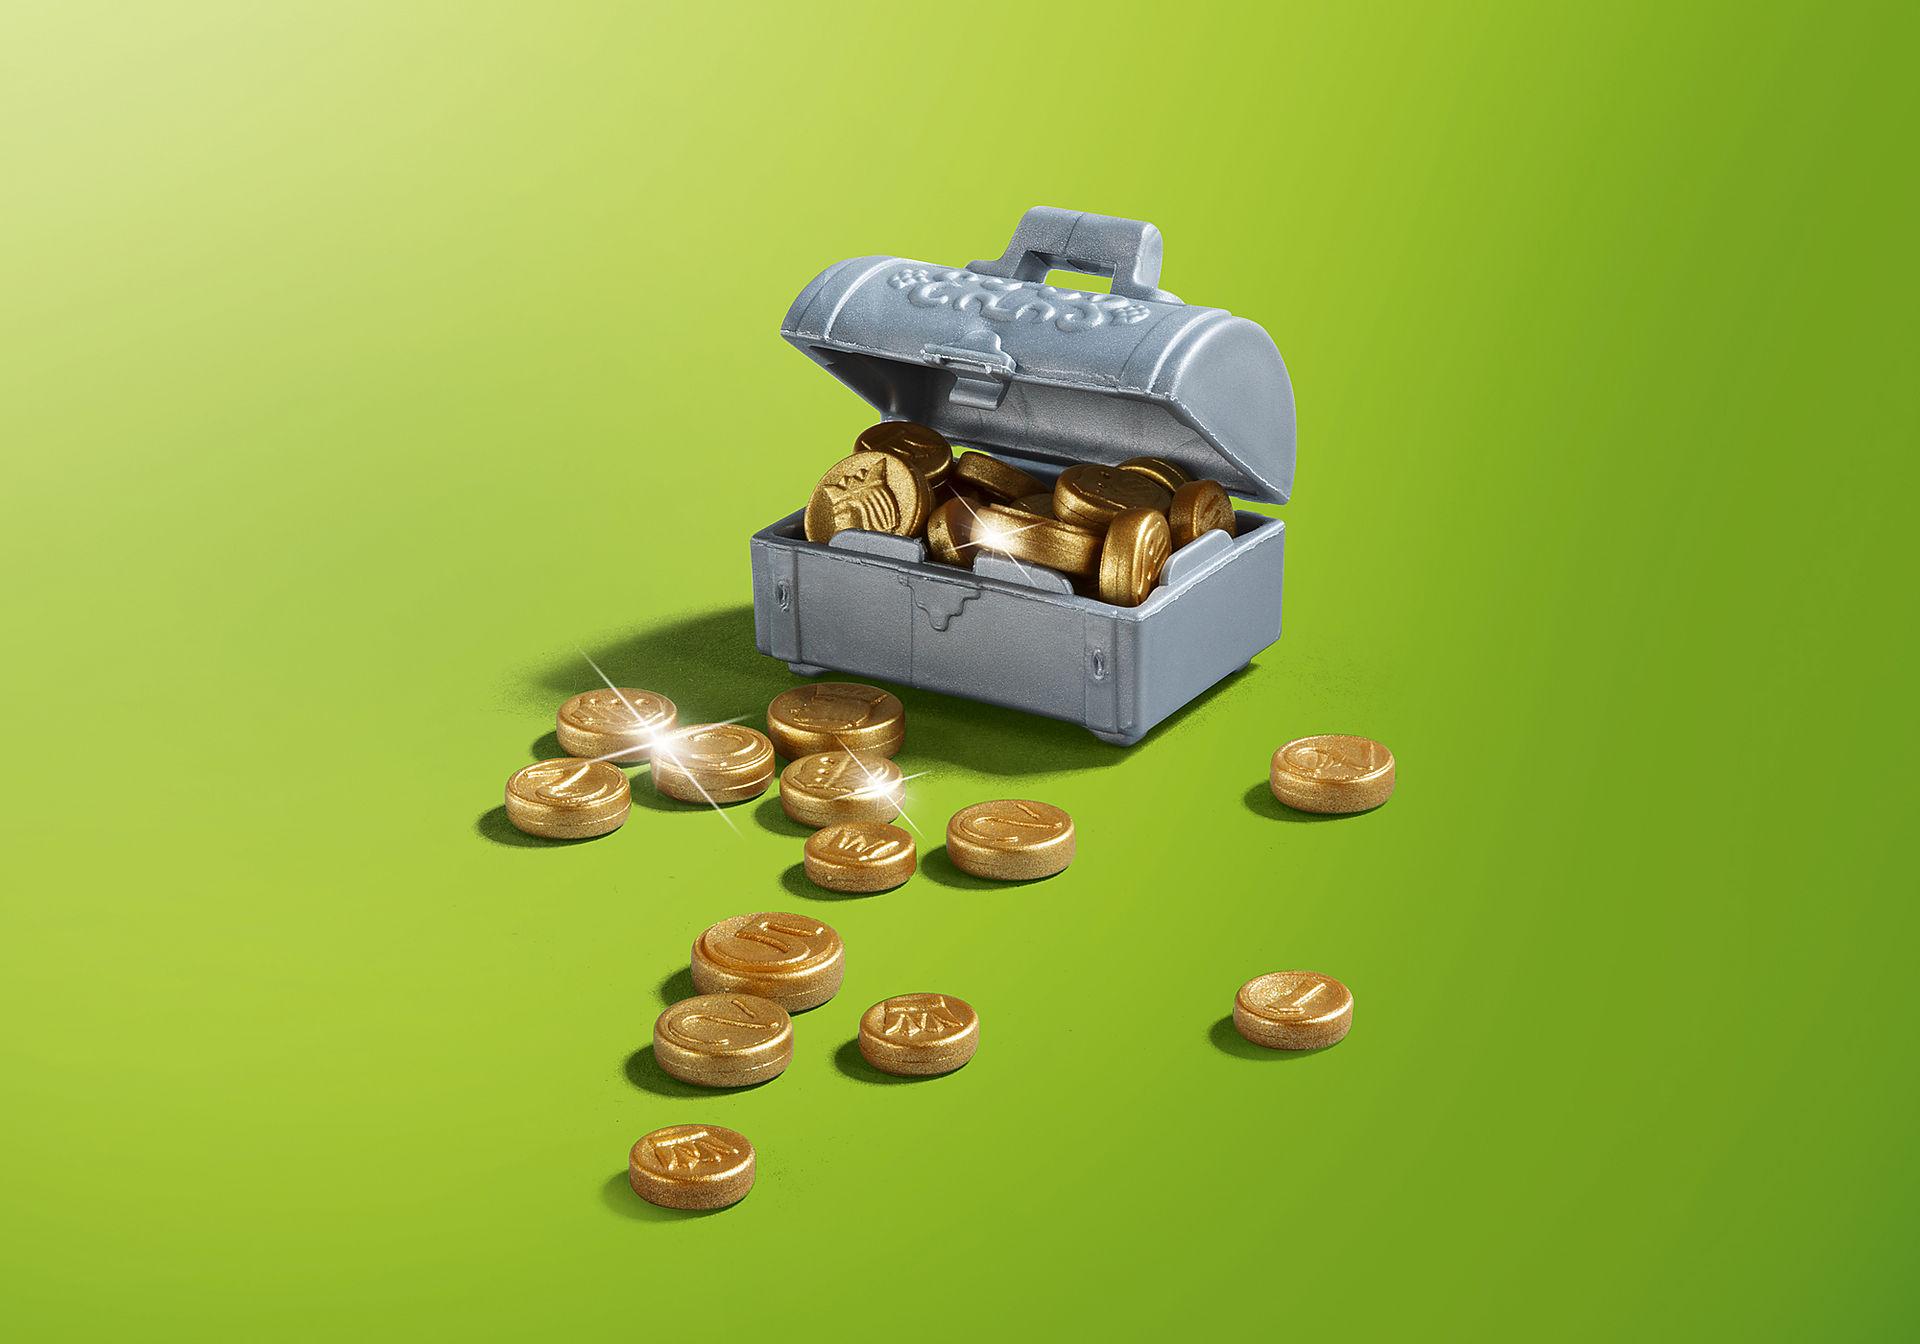 http://media.playmobil.com/i/playmobil/5657_product_extra2/Maxi Βαλιτσάκι Ιππότης με δράκο